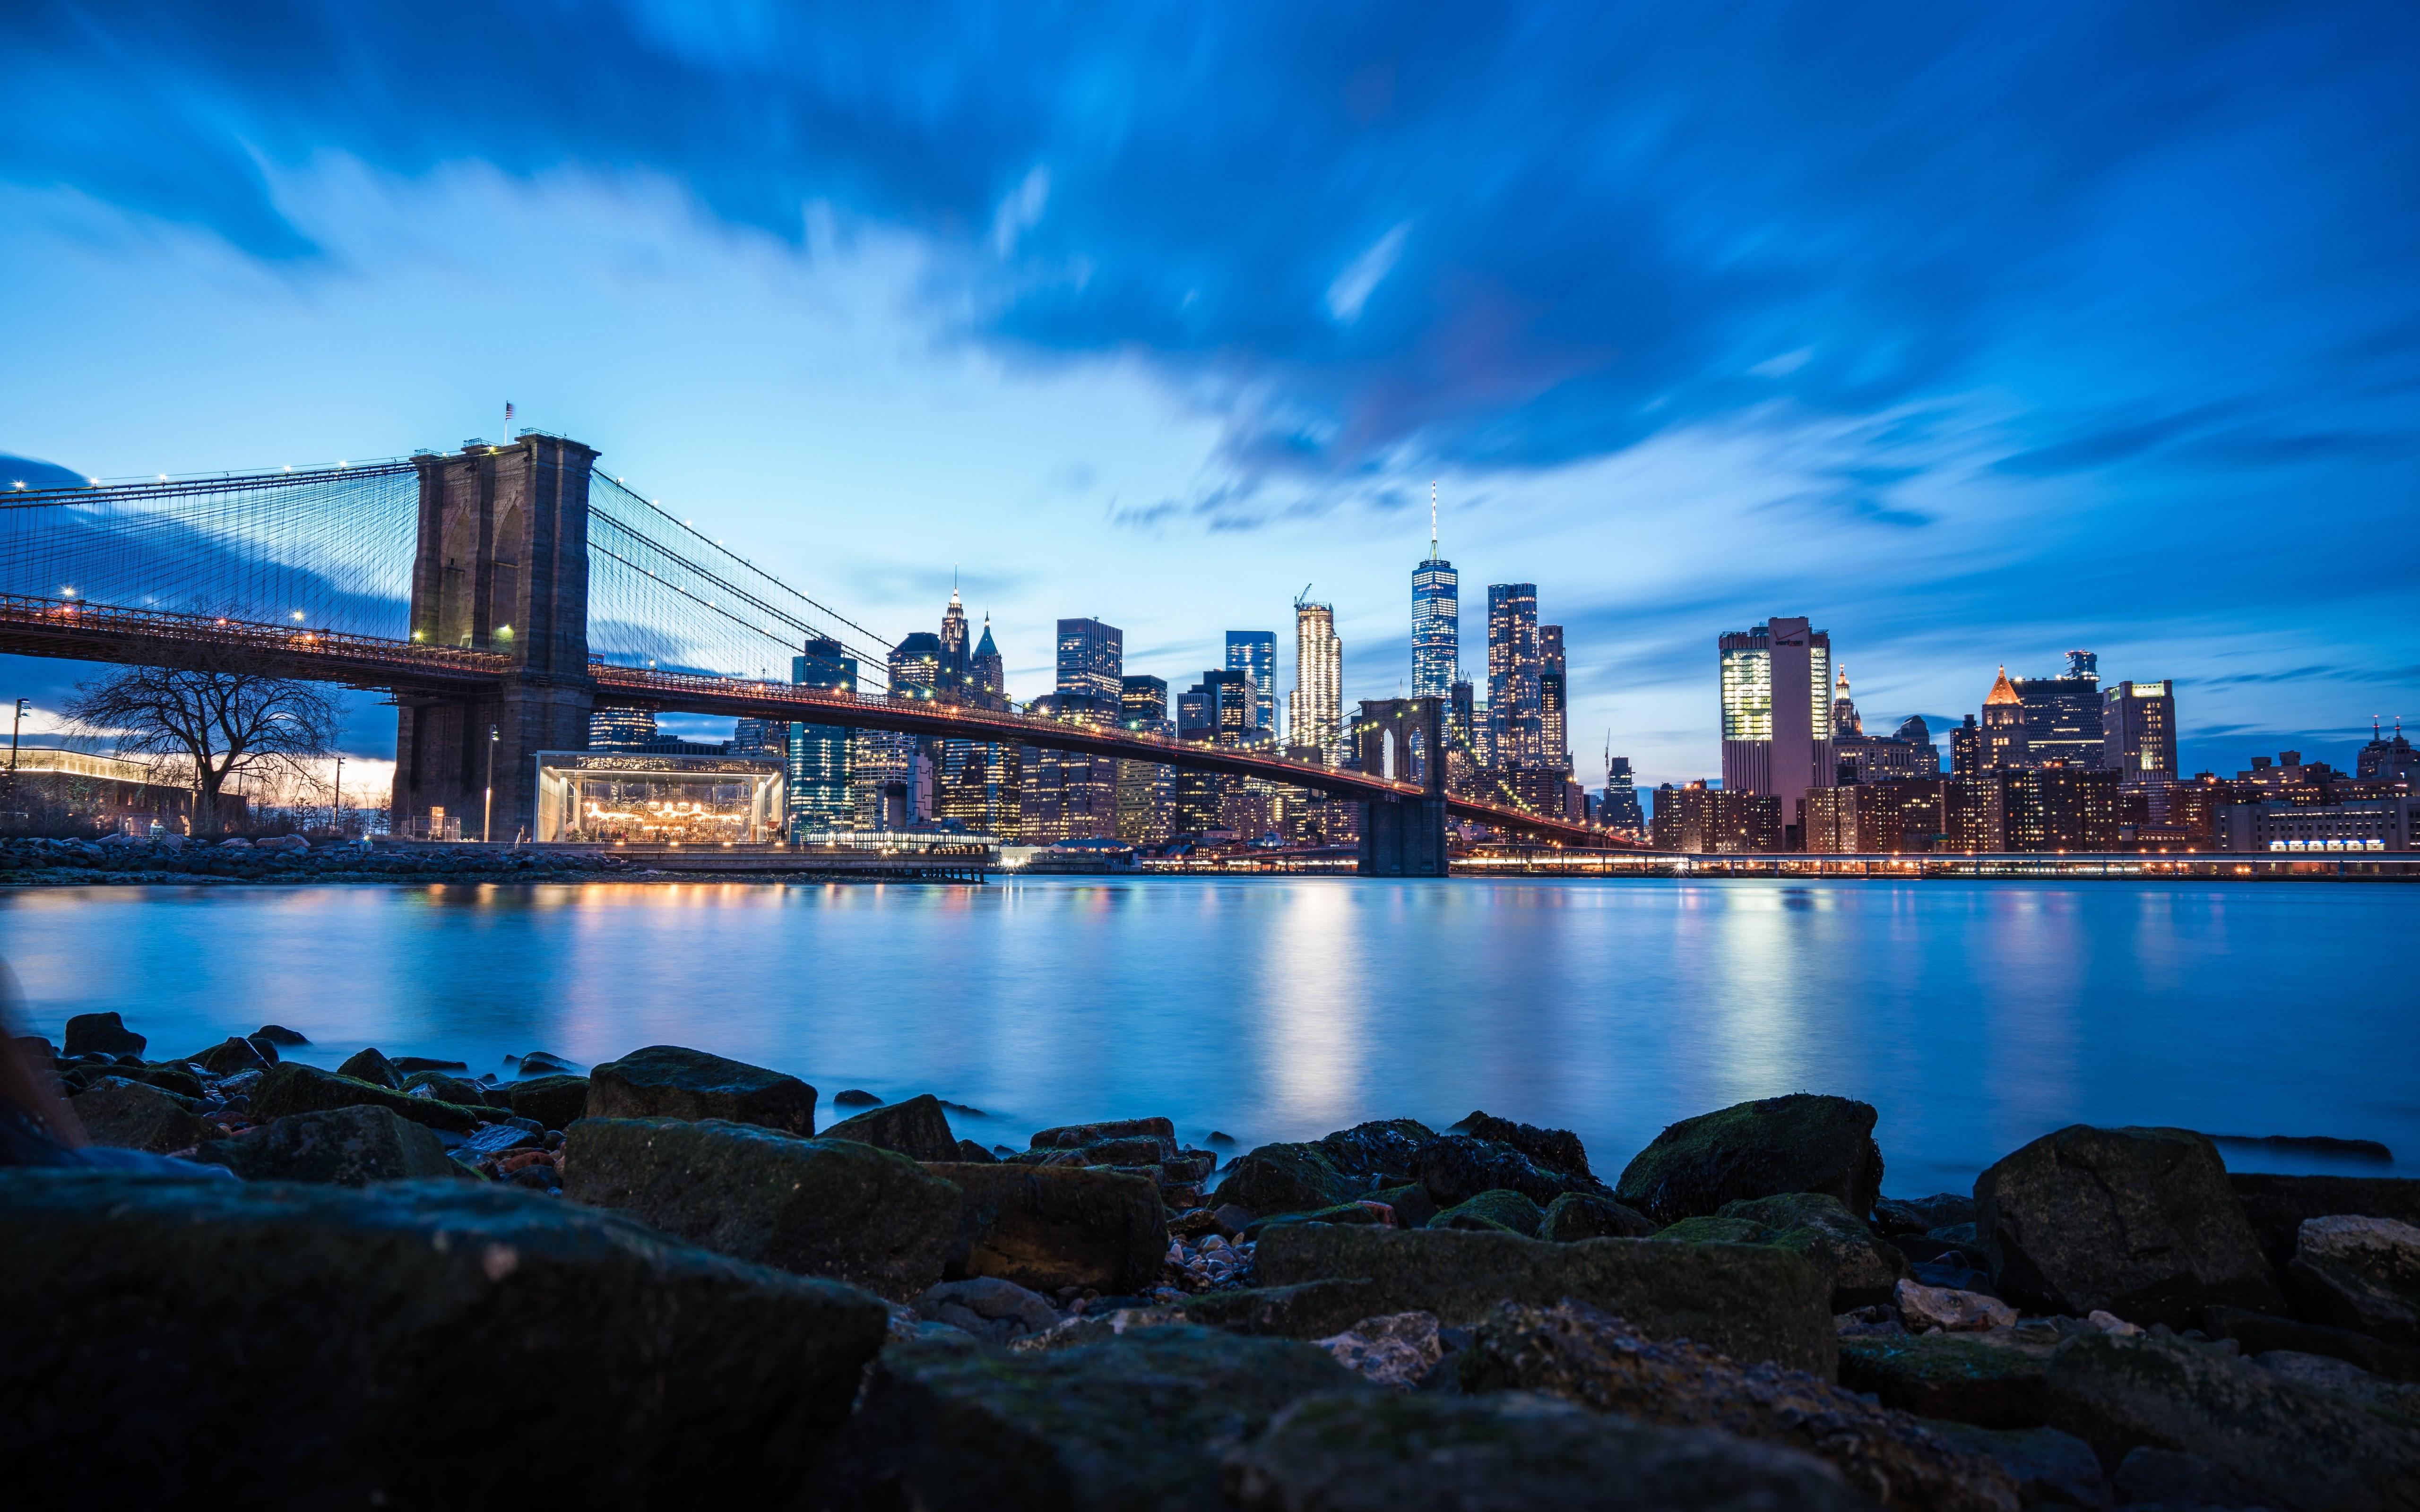 Download Wallpaper: Brooklyn Bridge 5120x3200